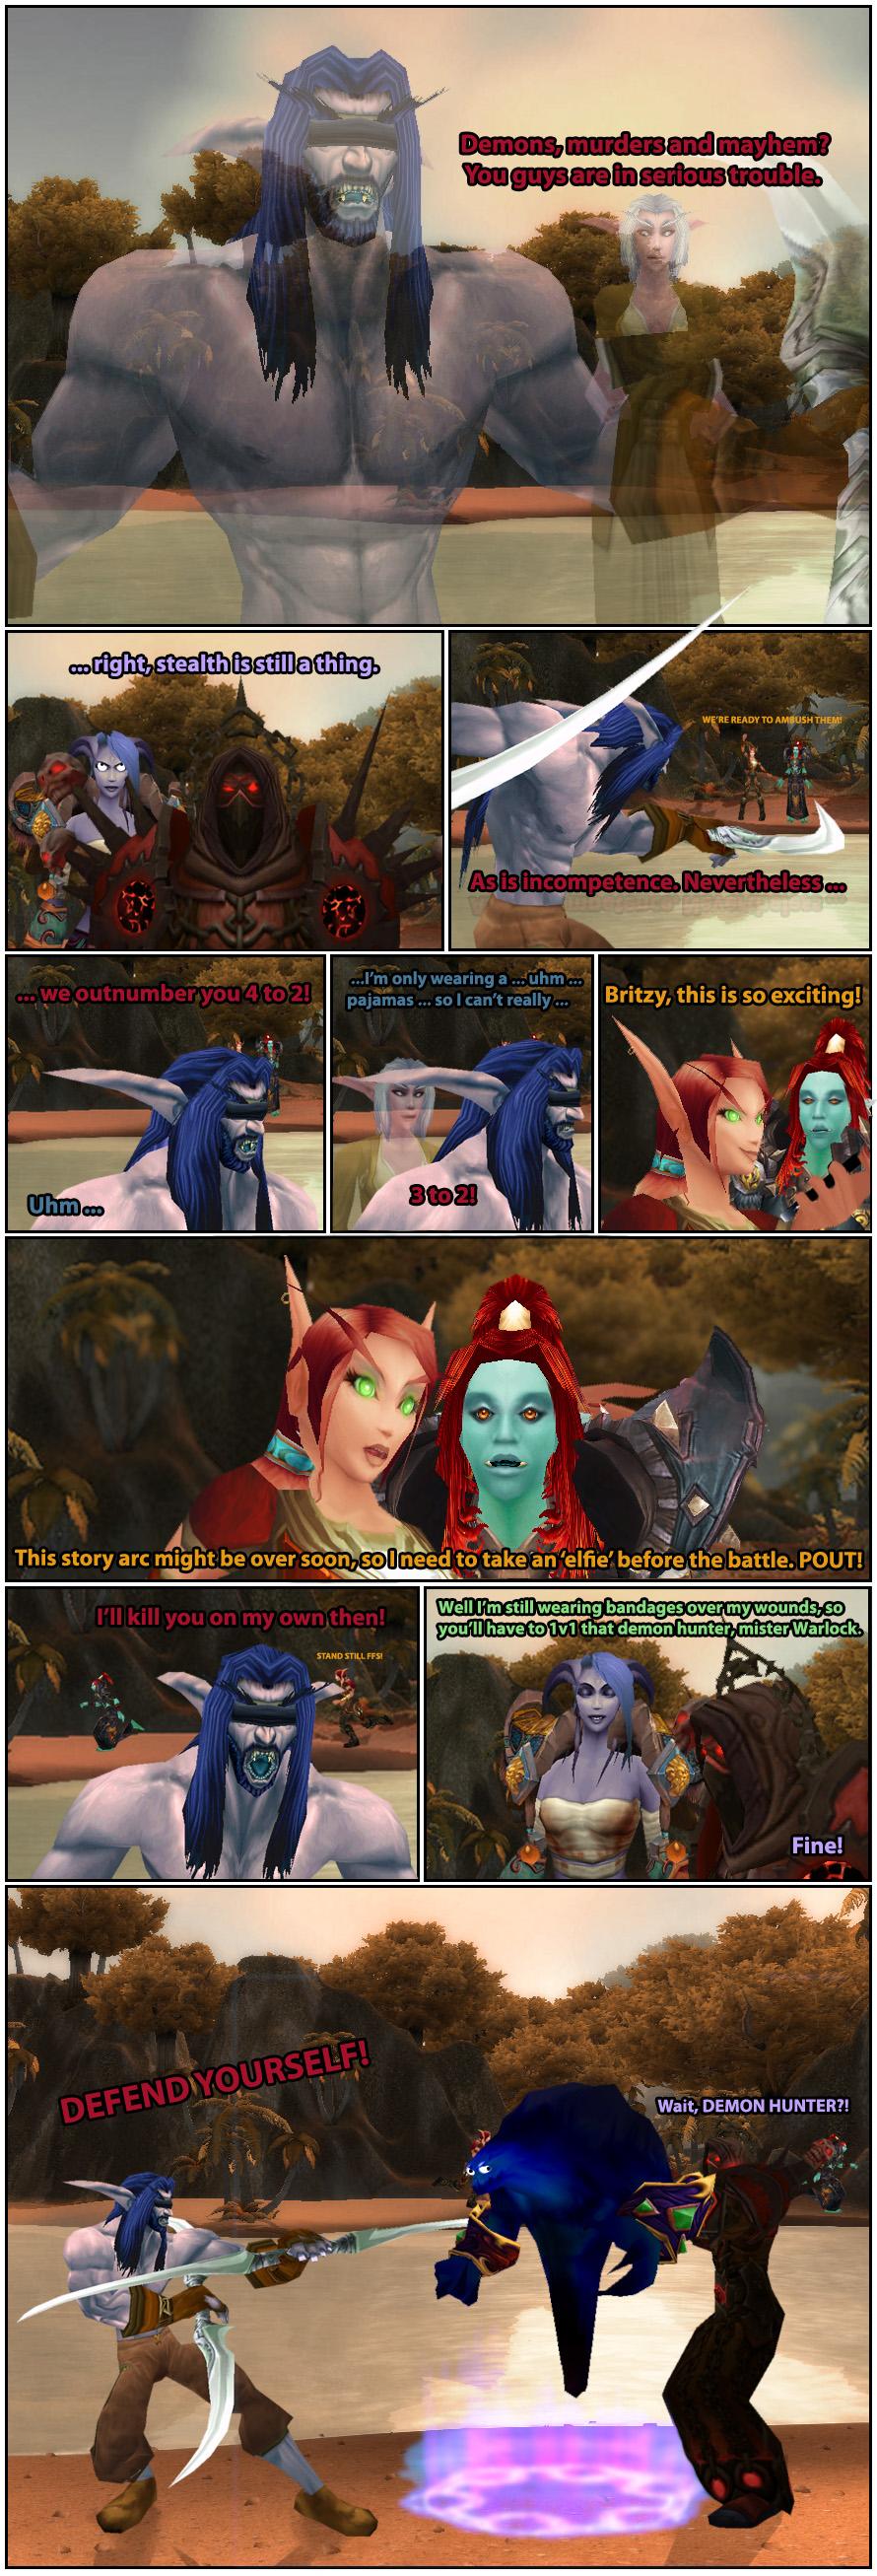 Elfies are a strange phenomenon.